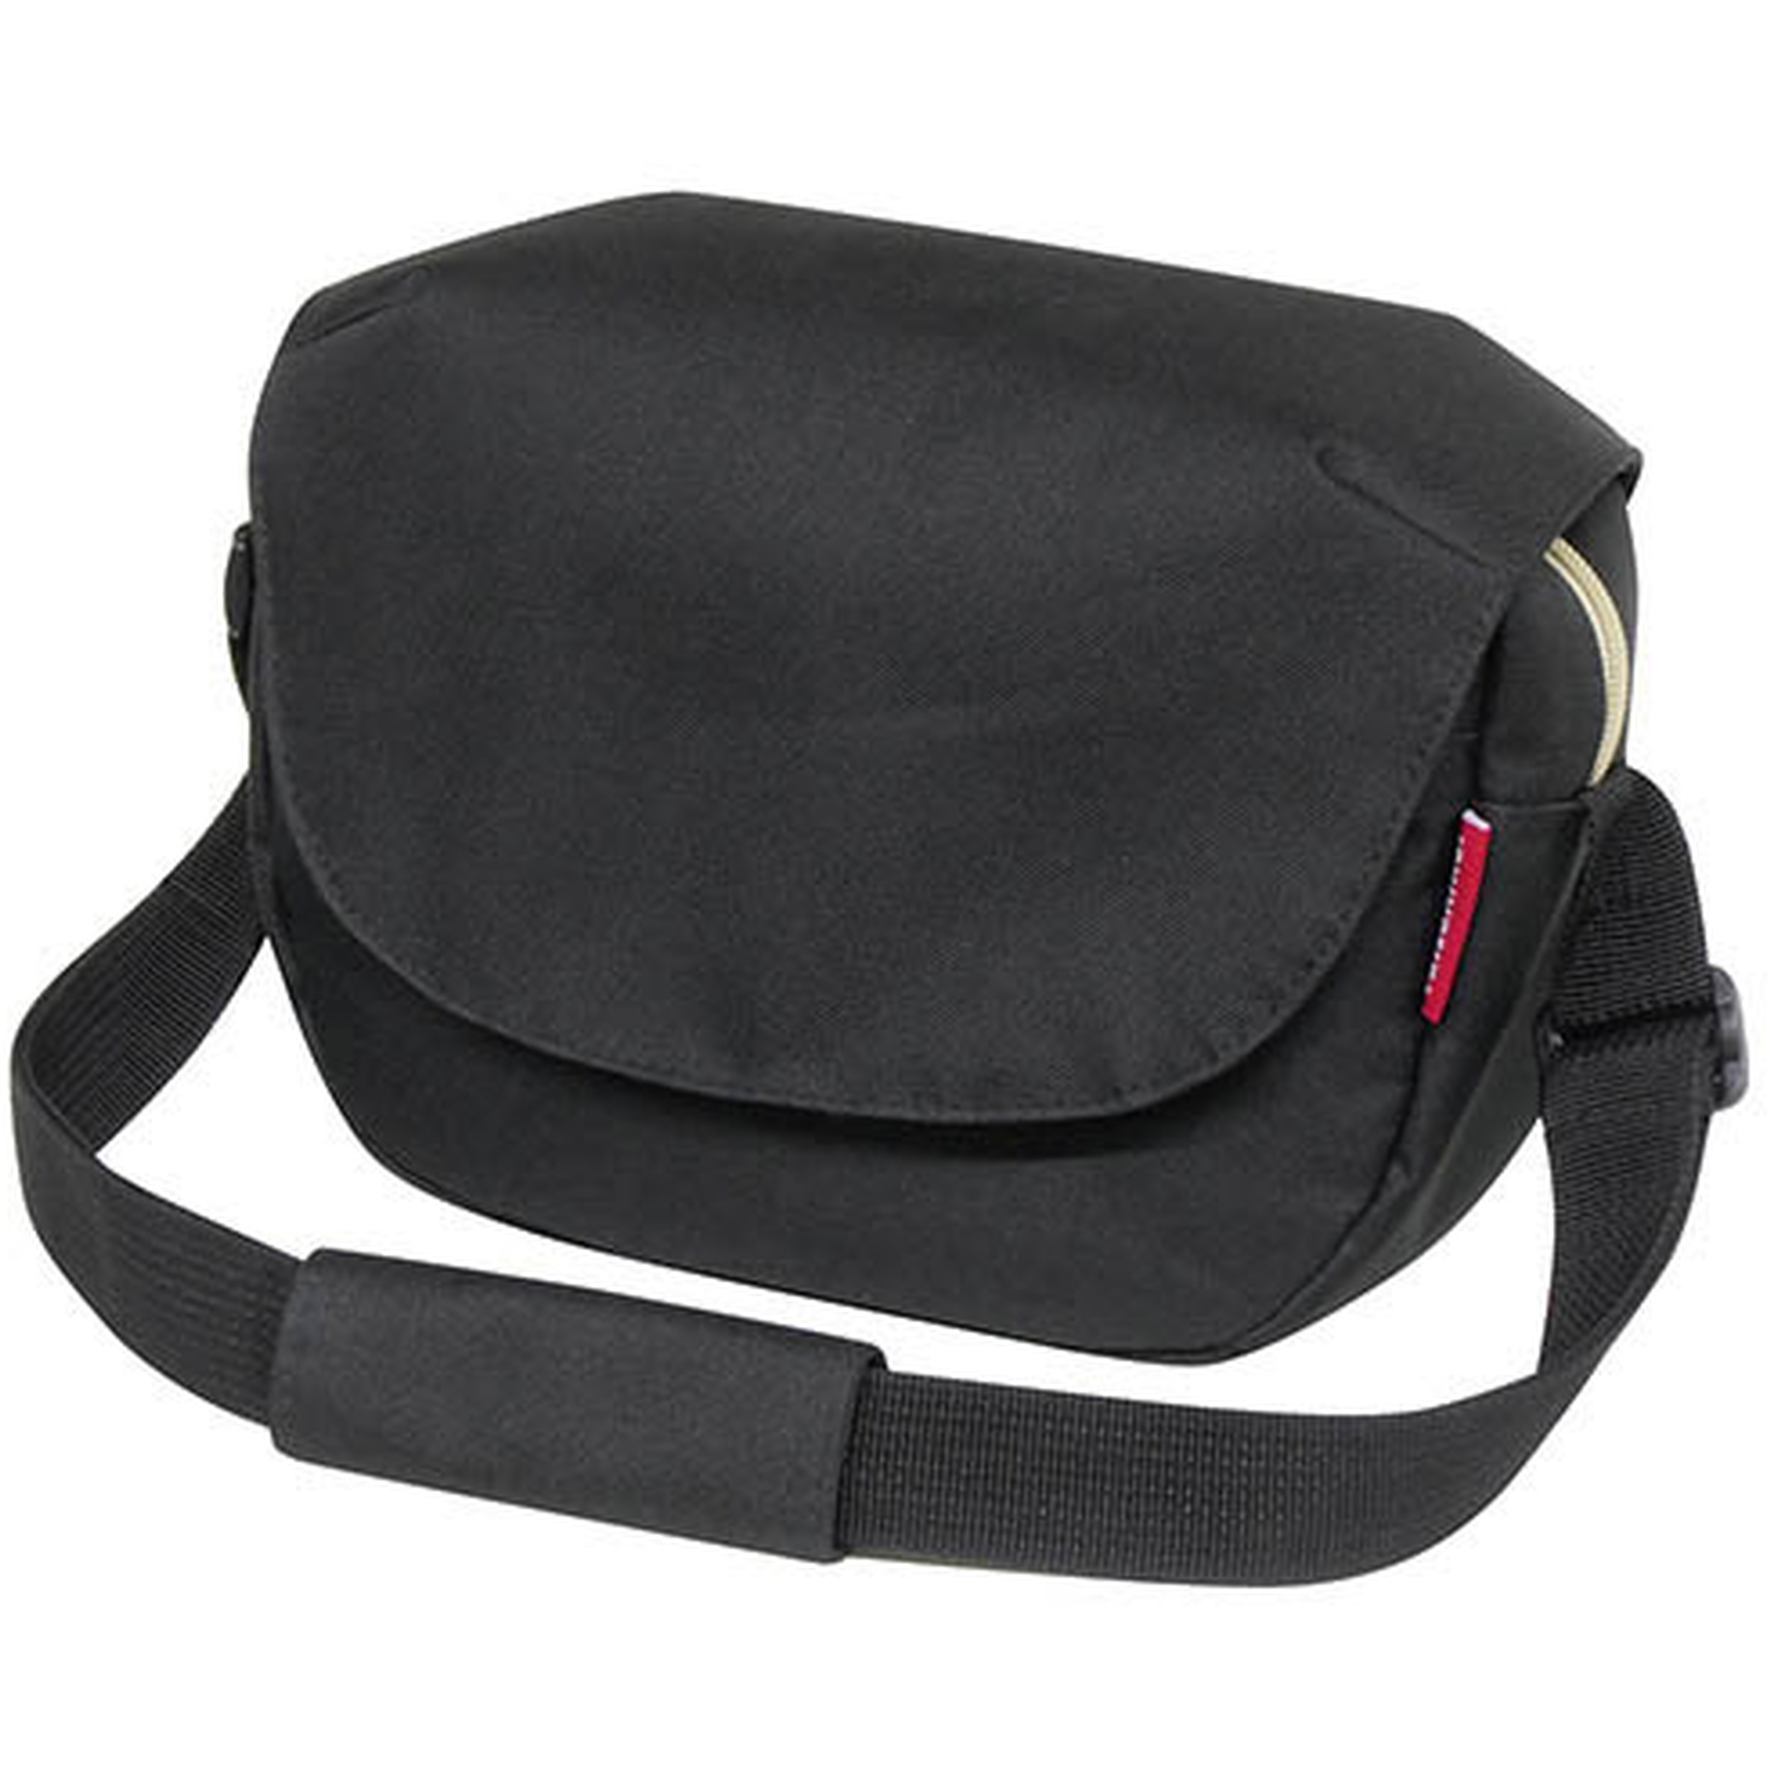 KLICKfix Funbag Handlebar Bag - black